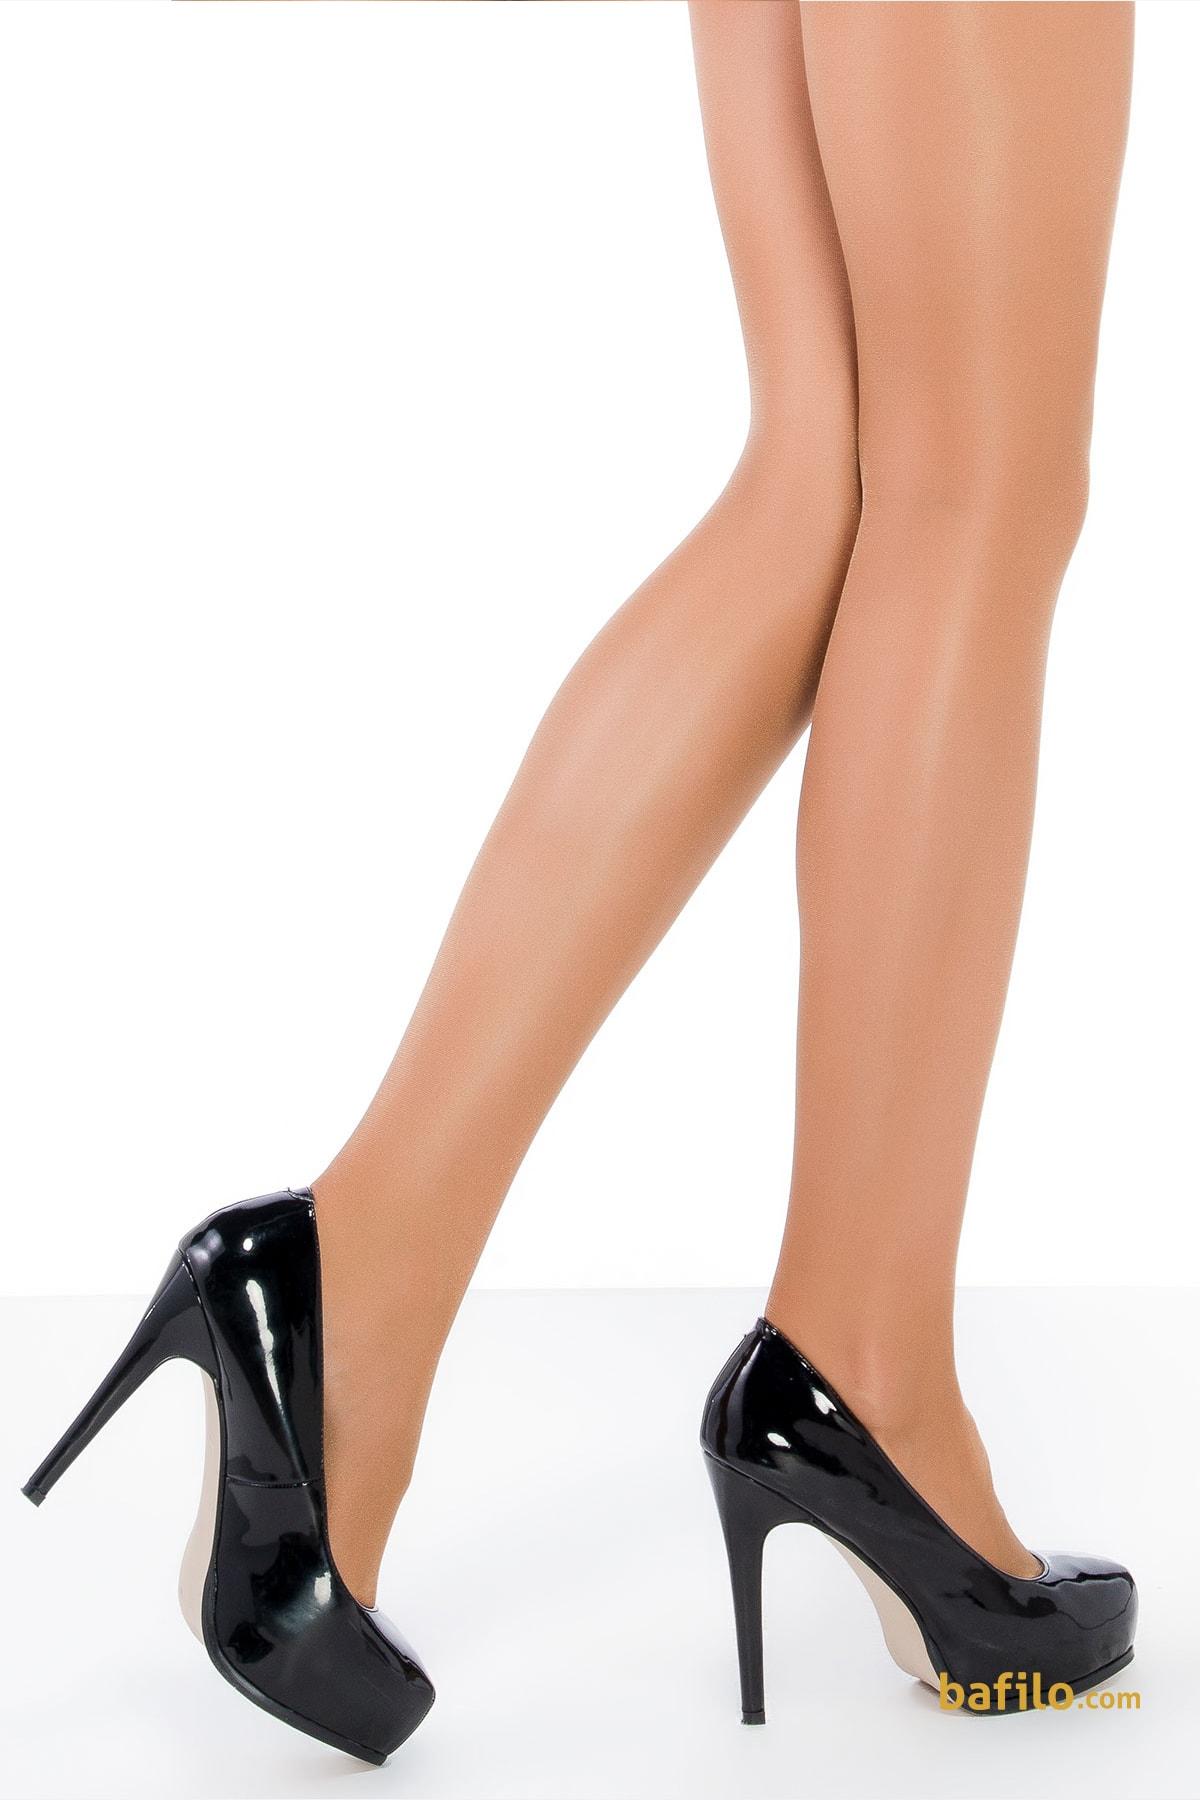 پنتی | Penti - جوراب شلواری زنانه پنتی Fit 20 - برنز